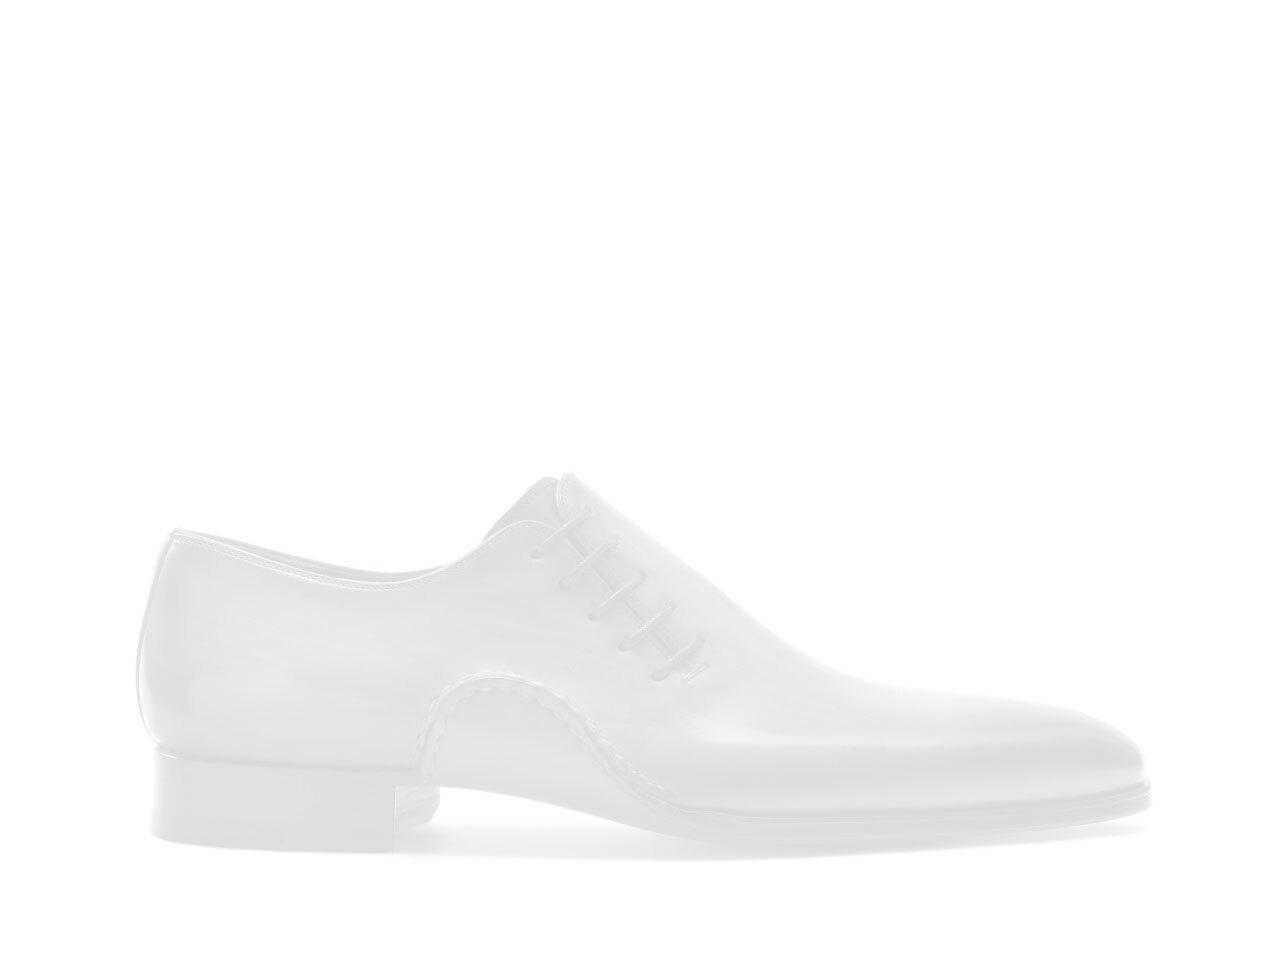 Sole of the Magnanni Borja Brown Men's Double Monk Strap Shoes